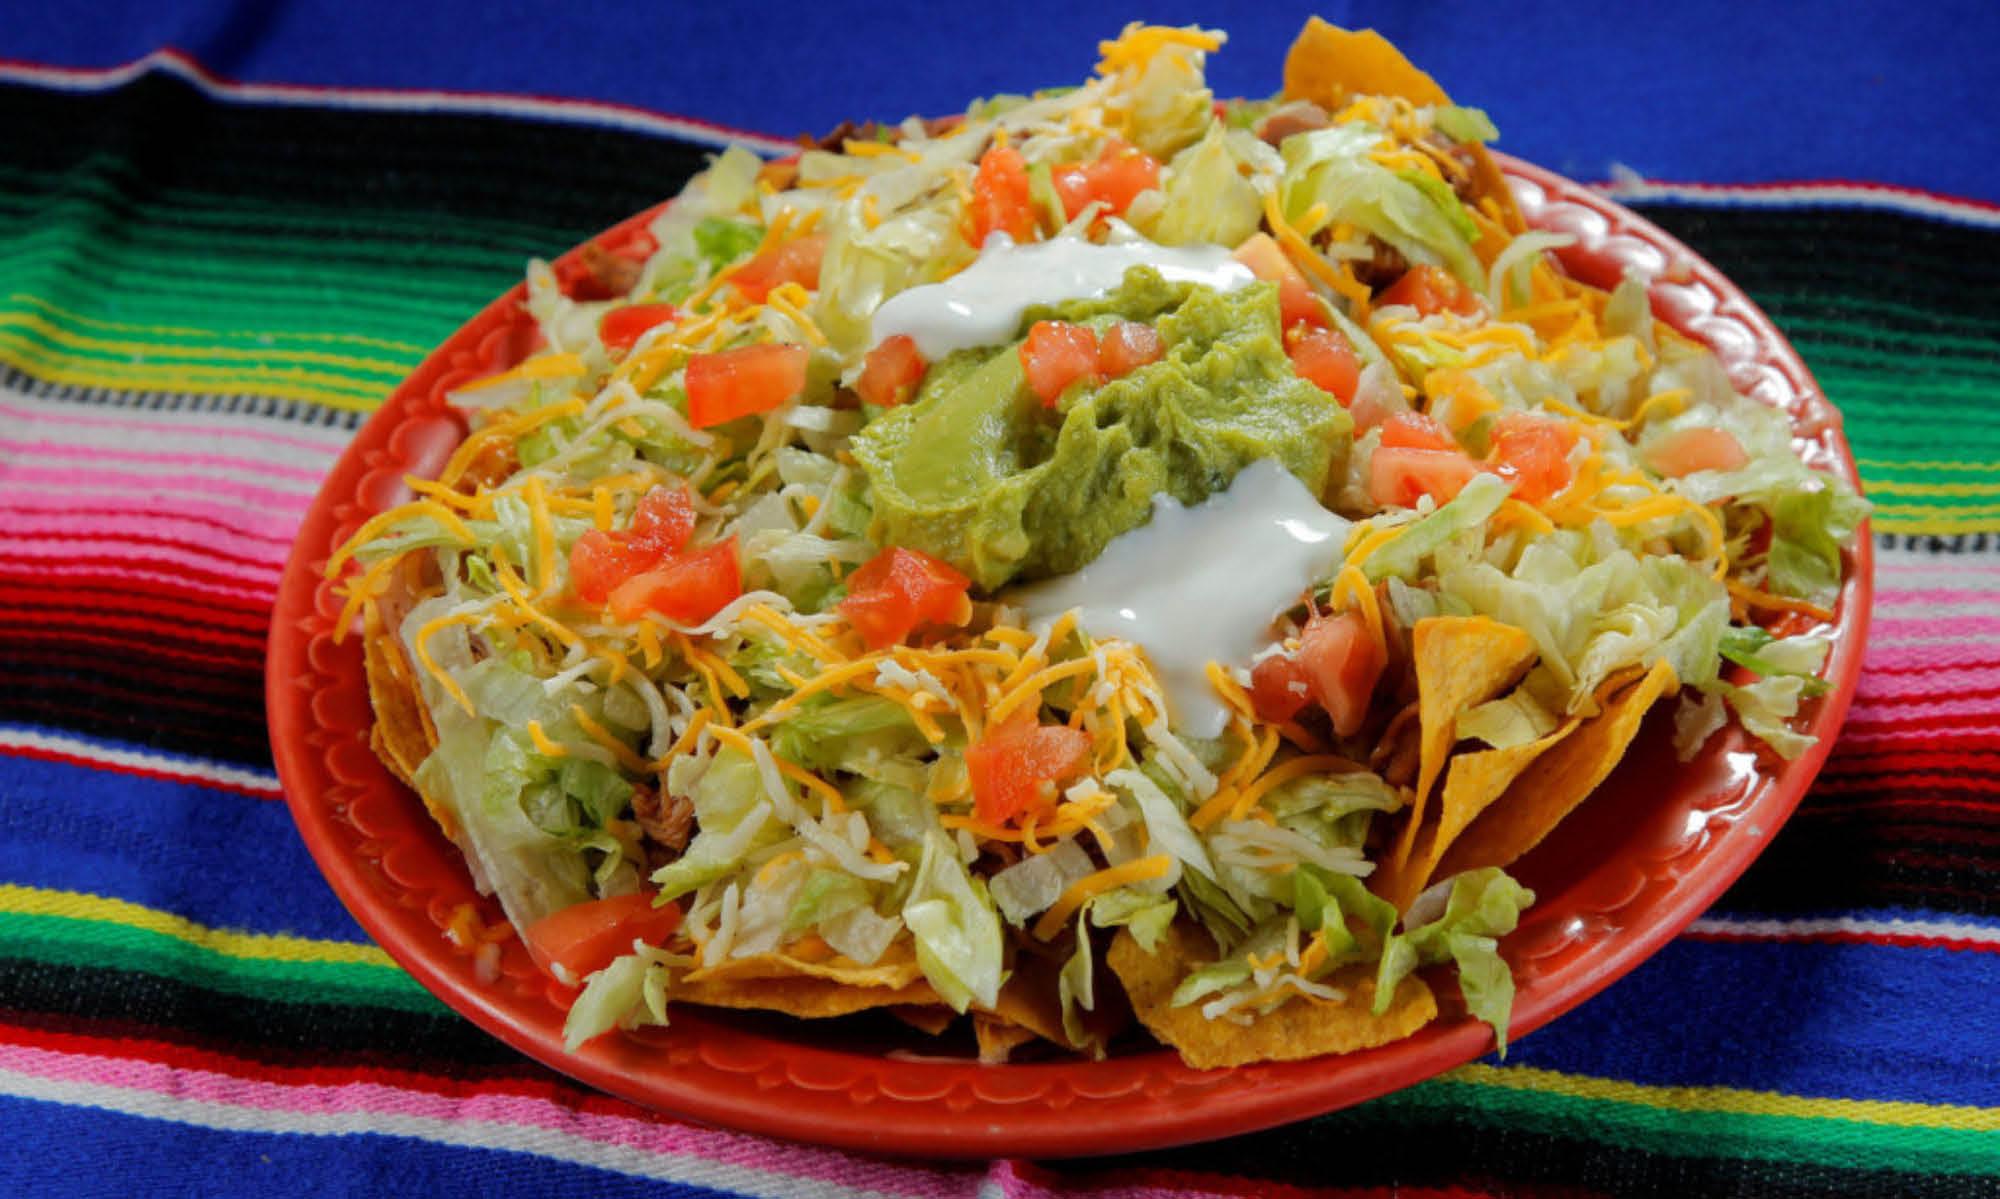 Try our Nachos Supremos. Add guacamole and sour cream.